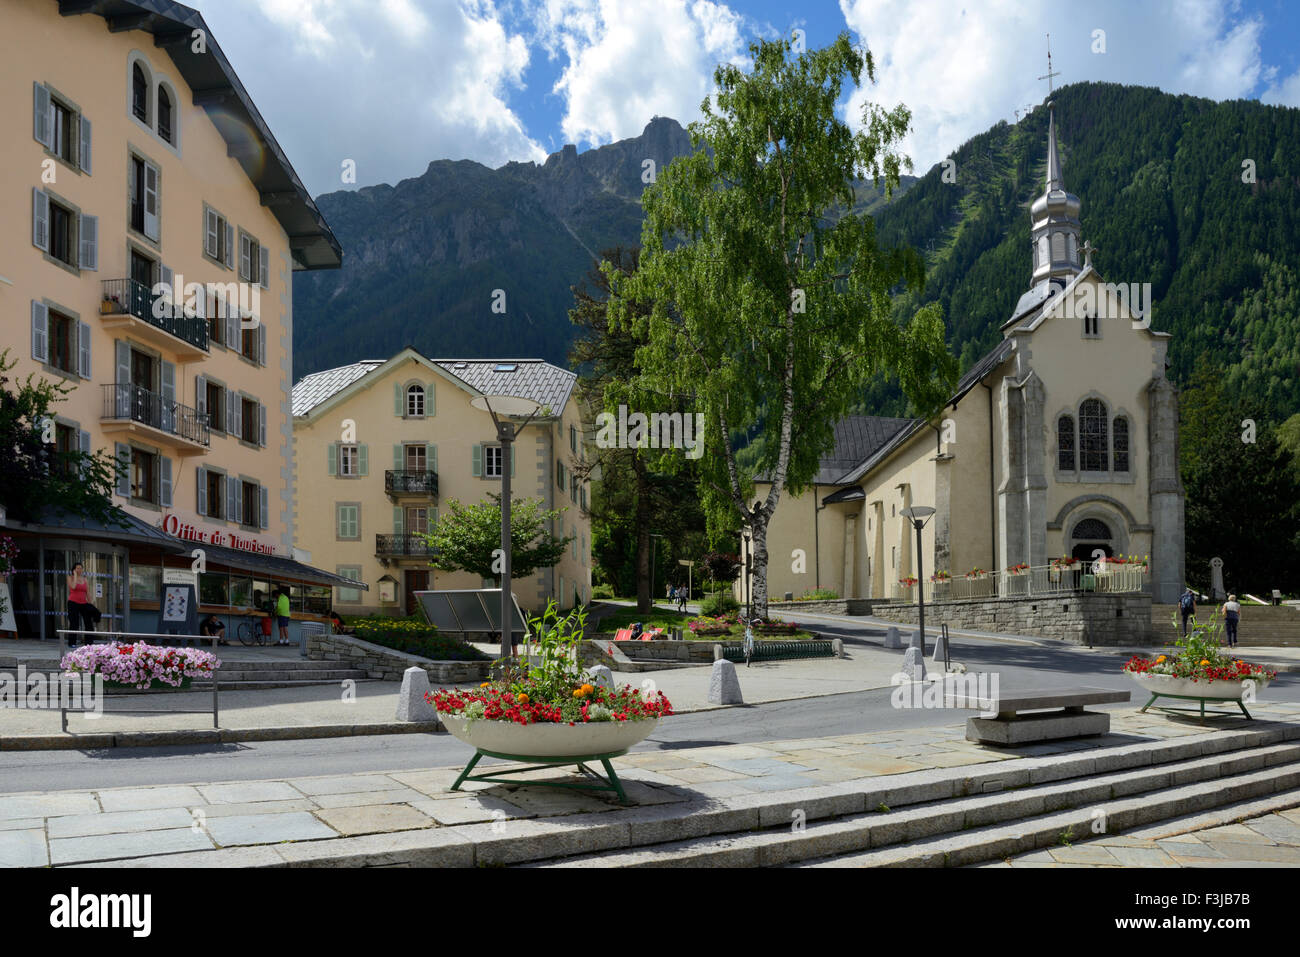 Office du tourisme chamonix mont blanc - Meteo chamonix office tourisme ...